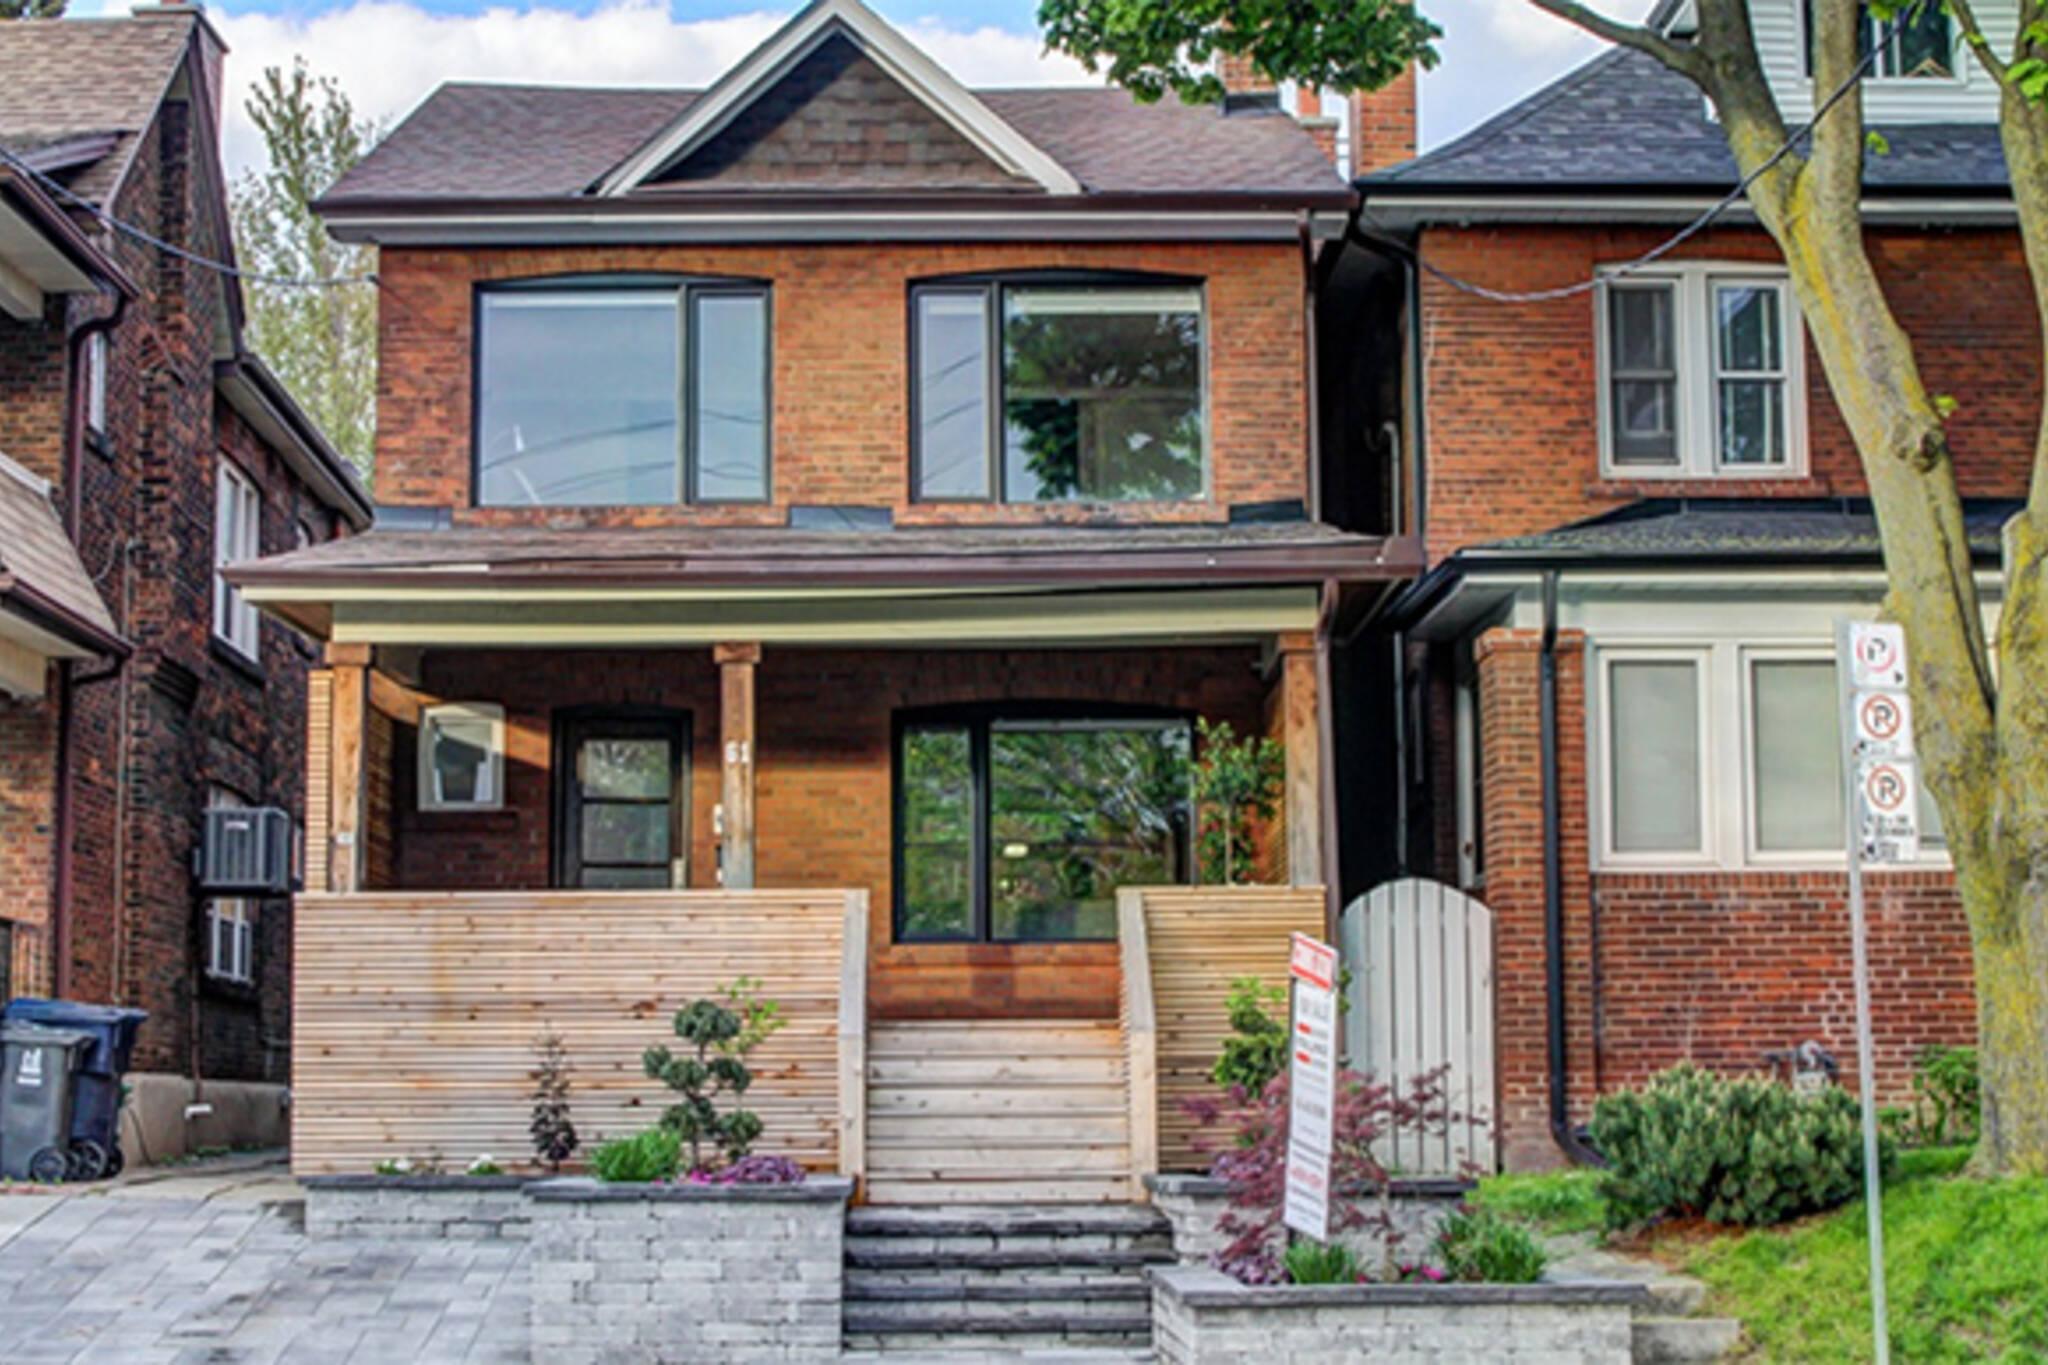 detached housing price toronto